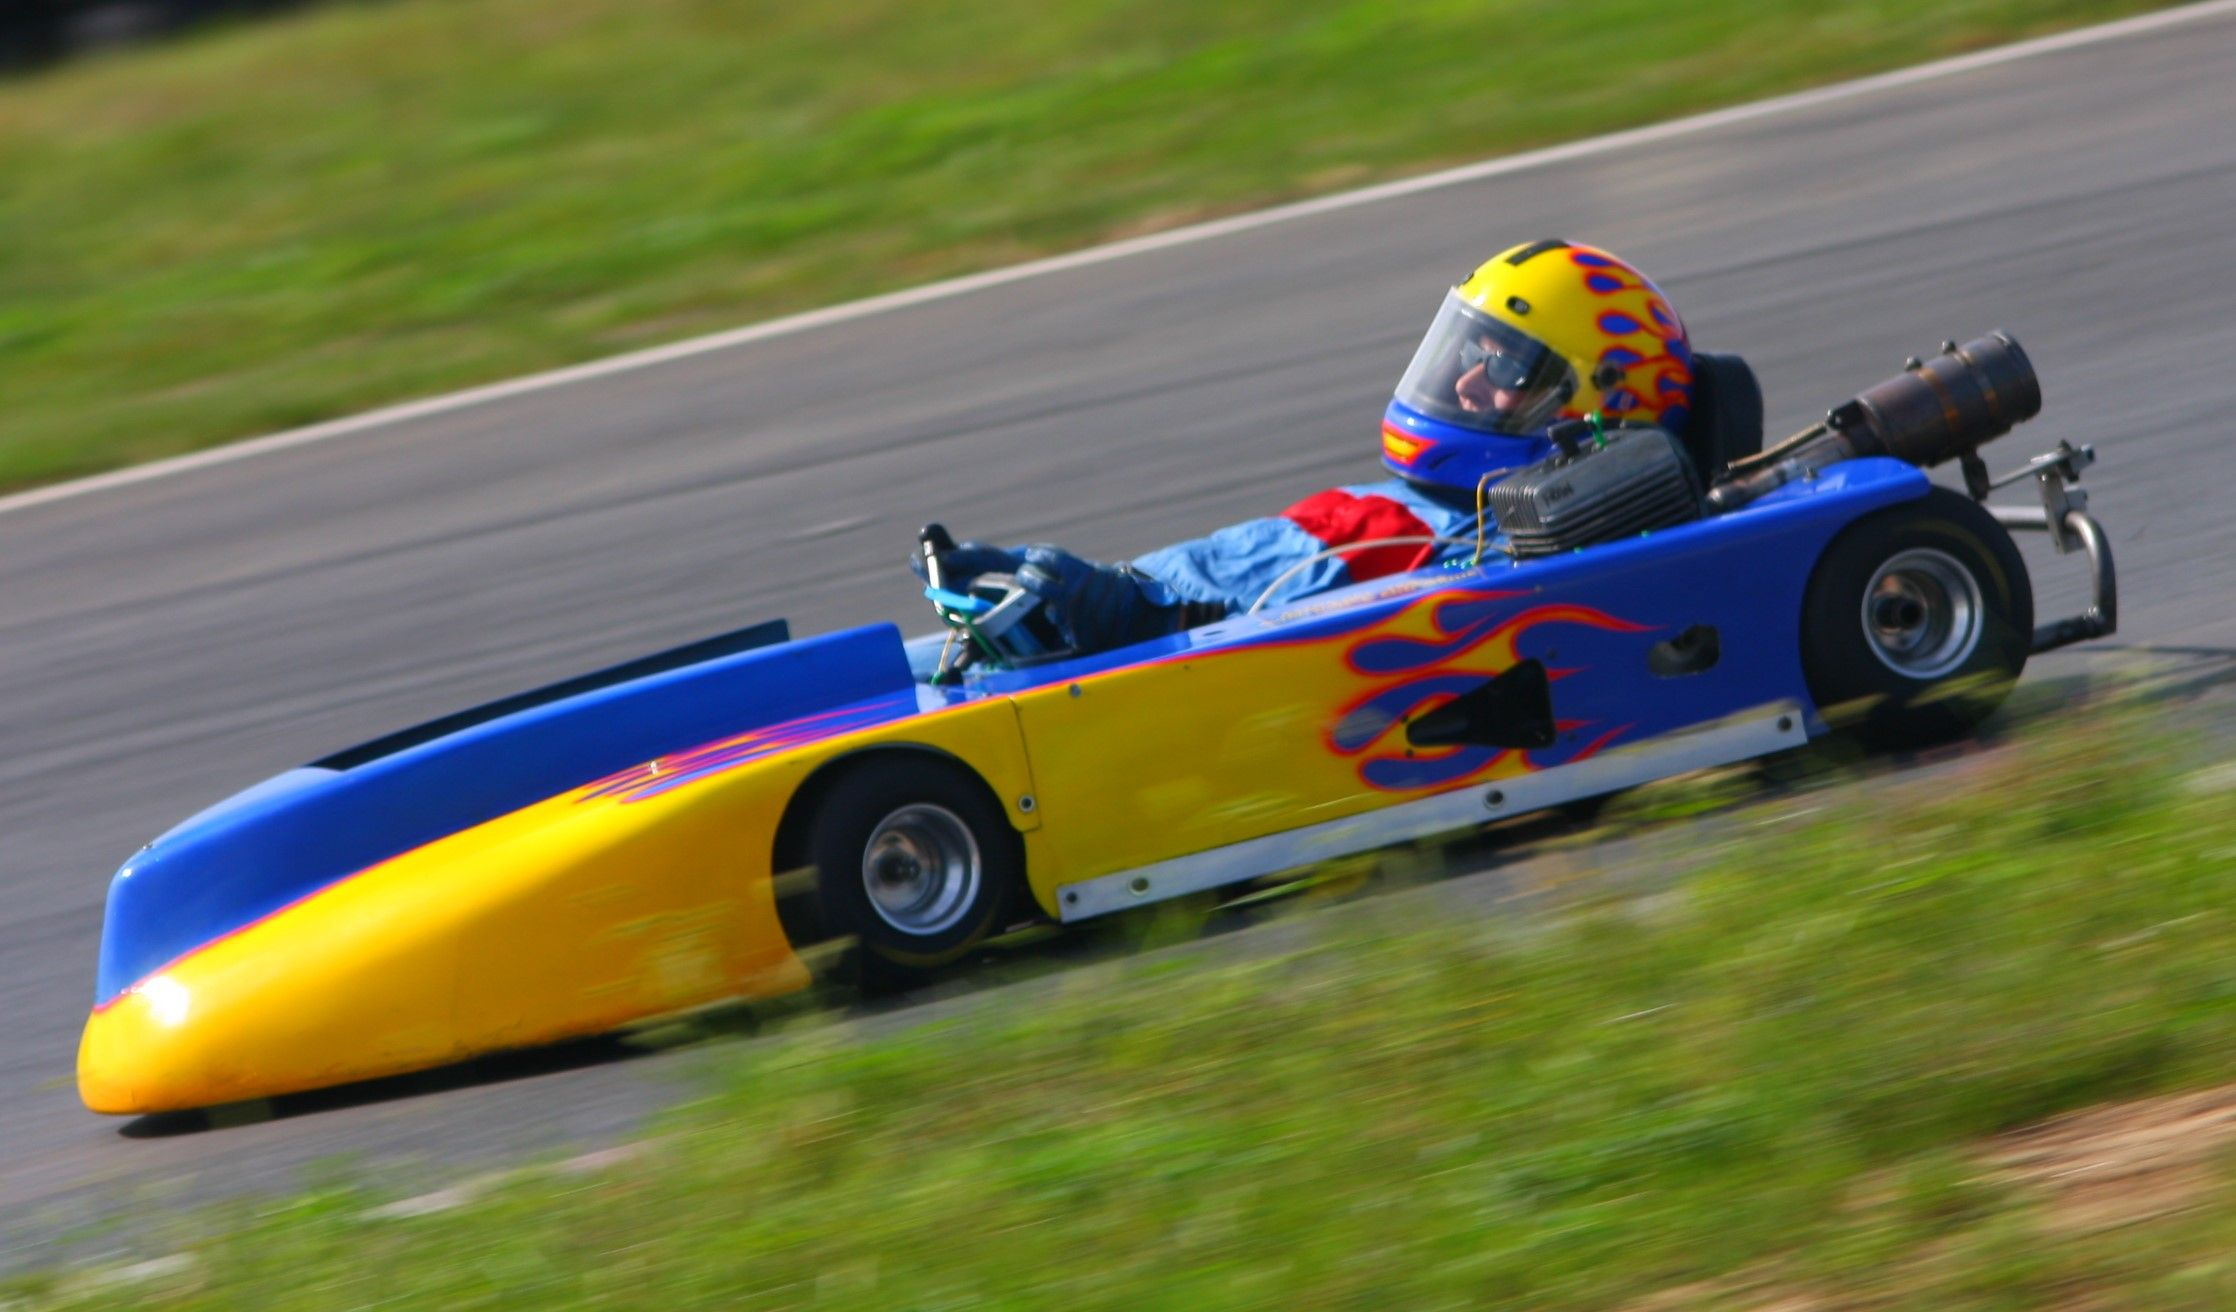 My sportsman setup at Thunderbolt, NJMP 2009 | Enduro karting | Kart